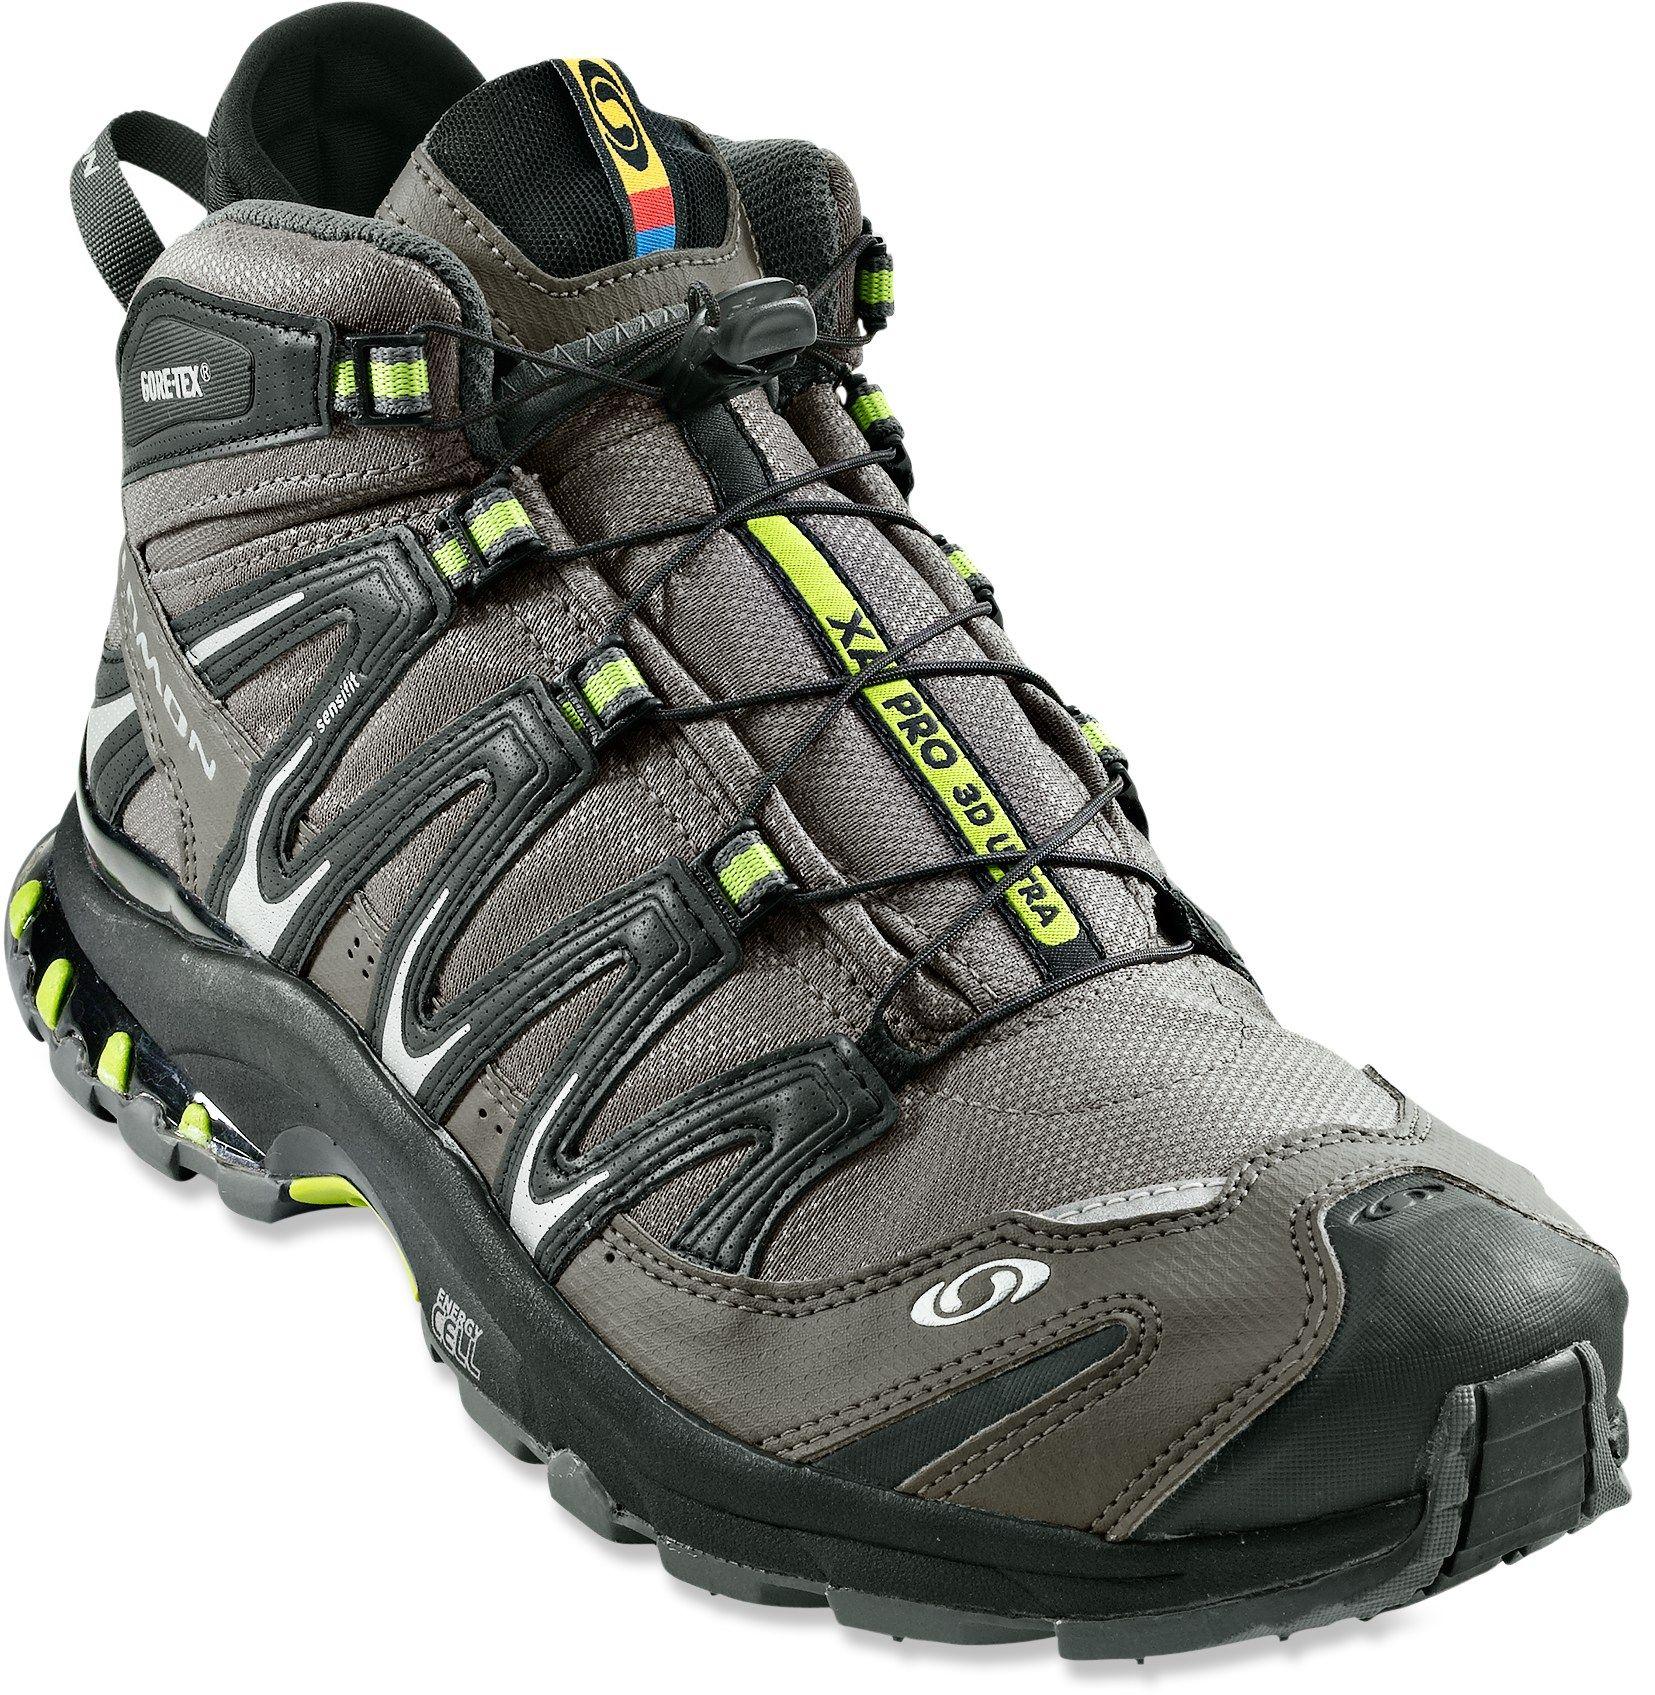 Salomon Xa Pro 3d Mid Gtx Ultra Hiking Boots Men S Rei Co Op Hiking Boots Boots Salomon Shoes